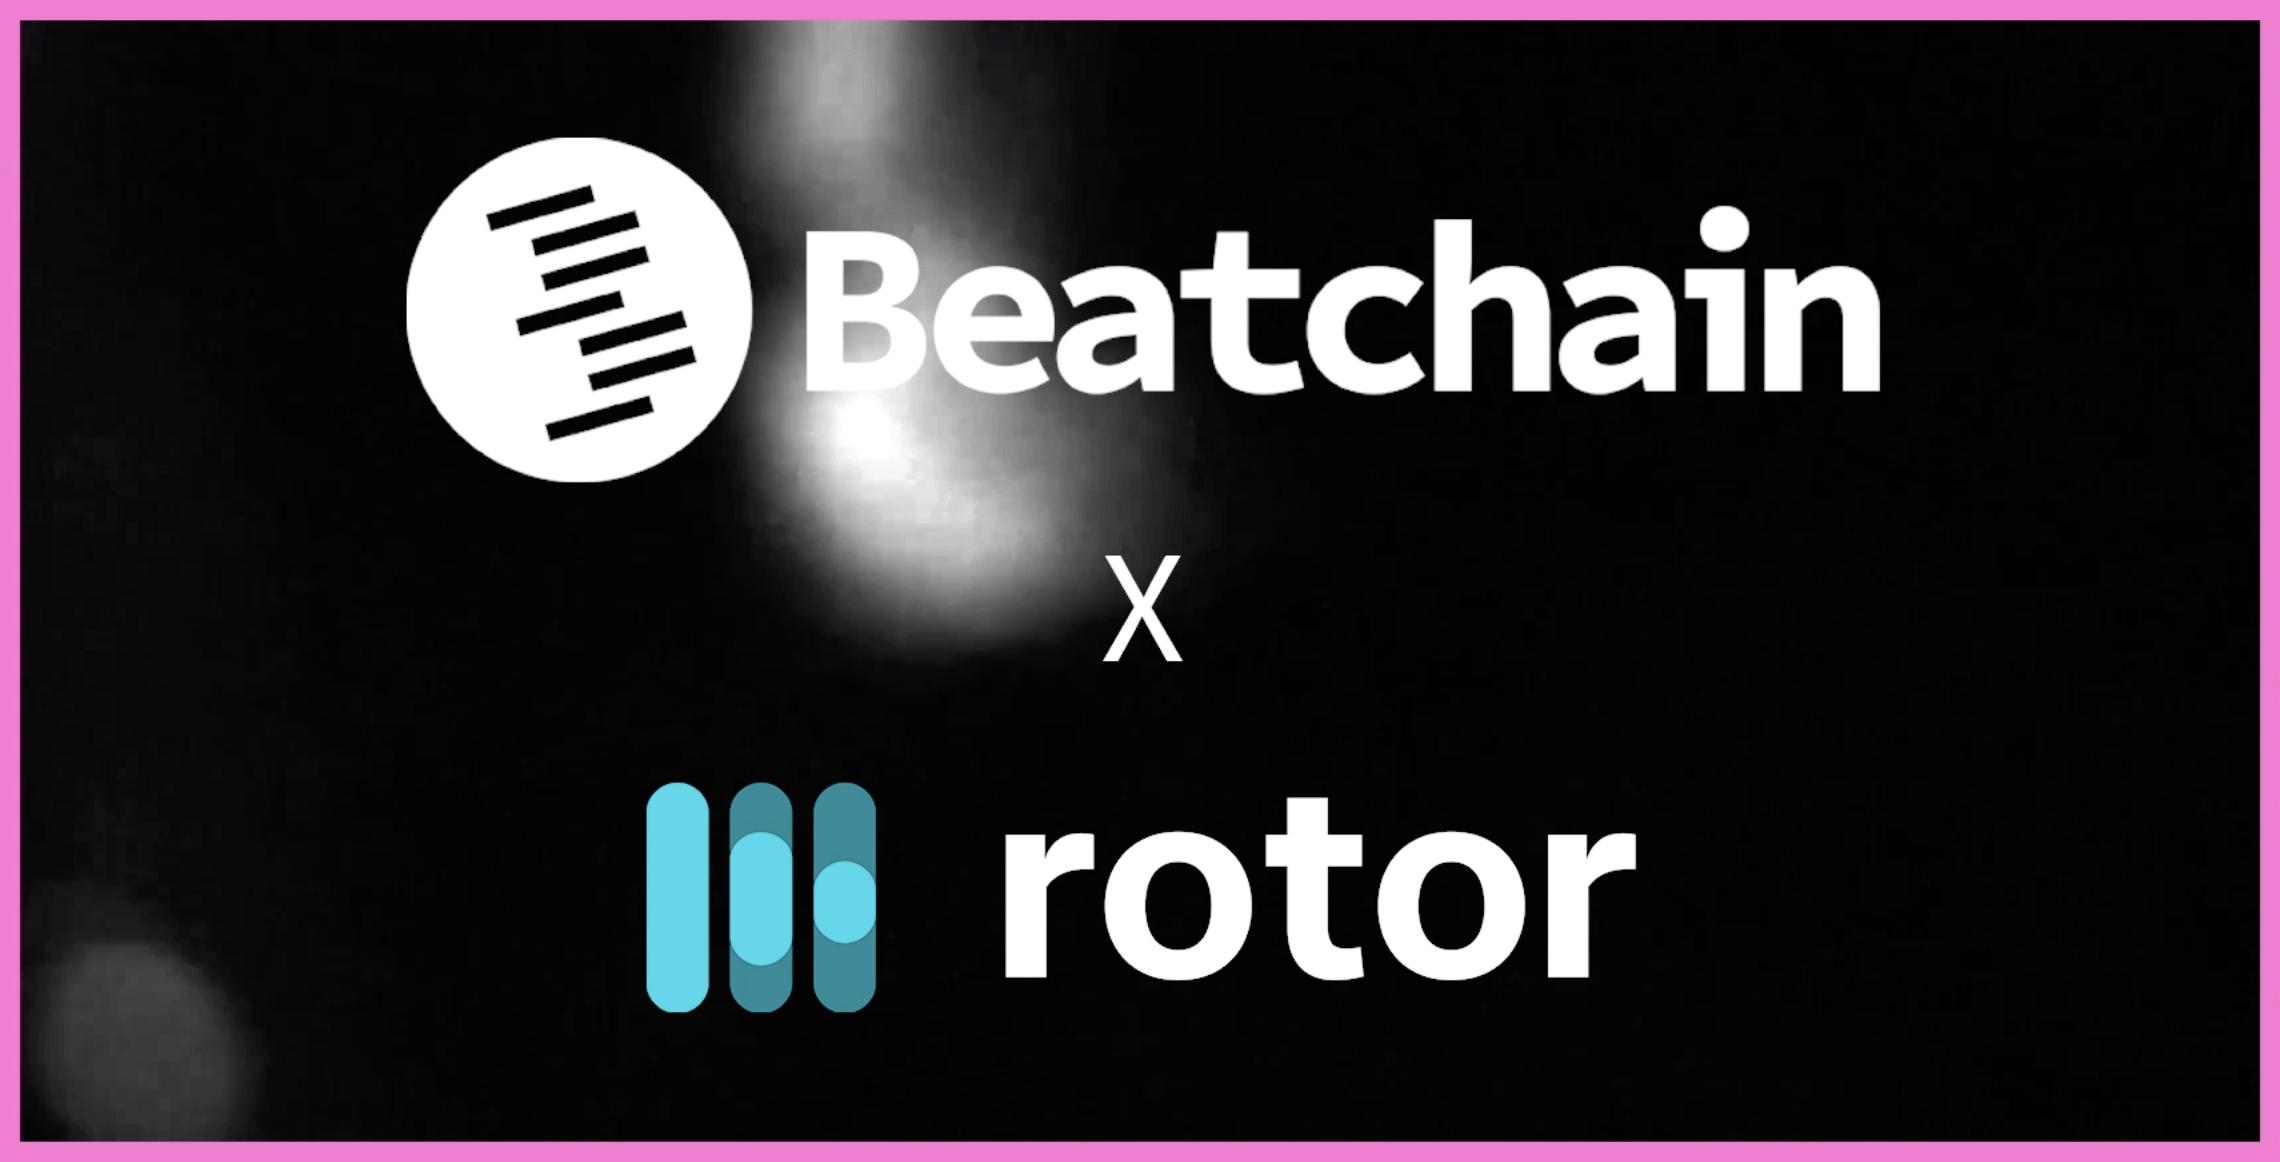 Rotor Videos Beatchain logos